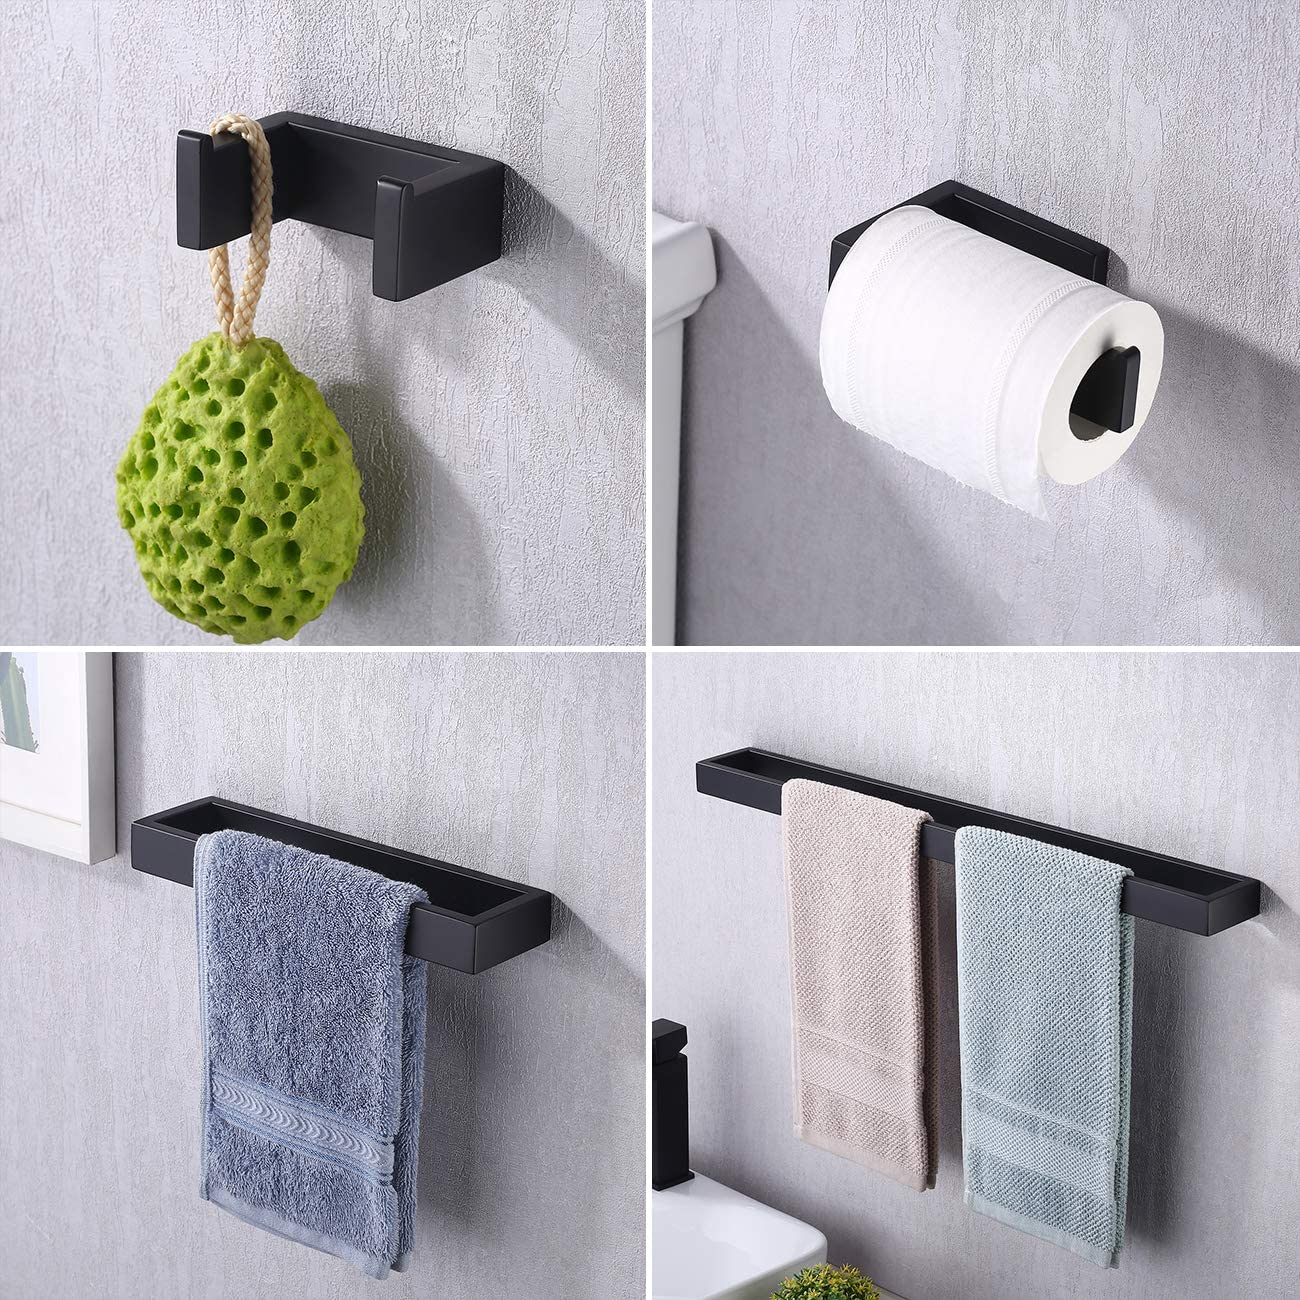 KES Bathroom Hardware Set 4 Piece Towel Bar Toilet Paper Holder Hook Wall Mounted No Drill Rustproof Matte Black Finish, LA230BKDG-42